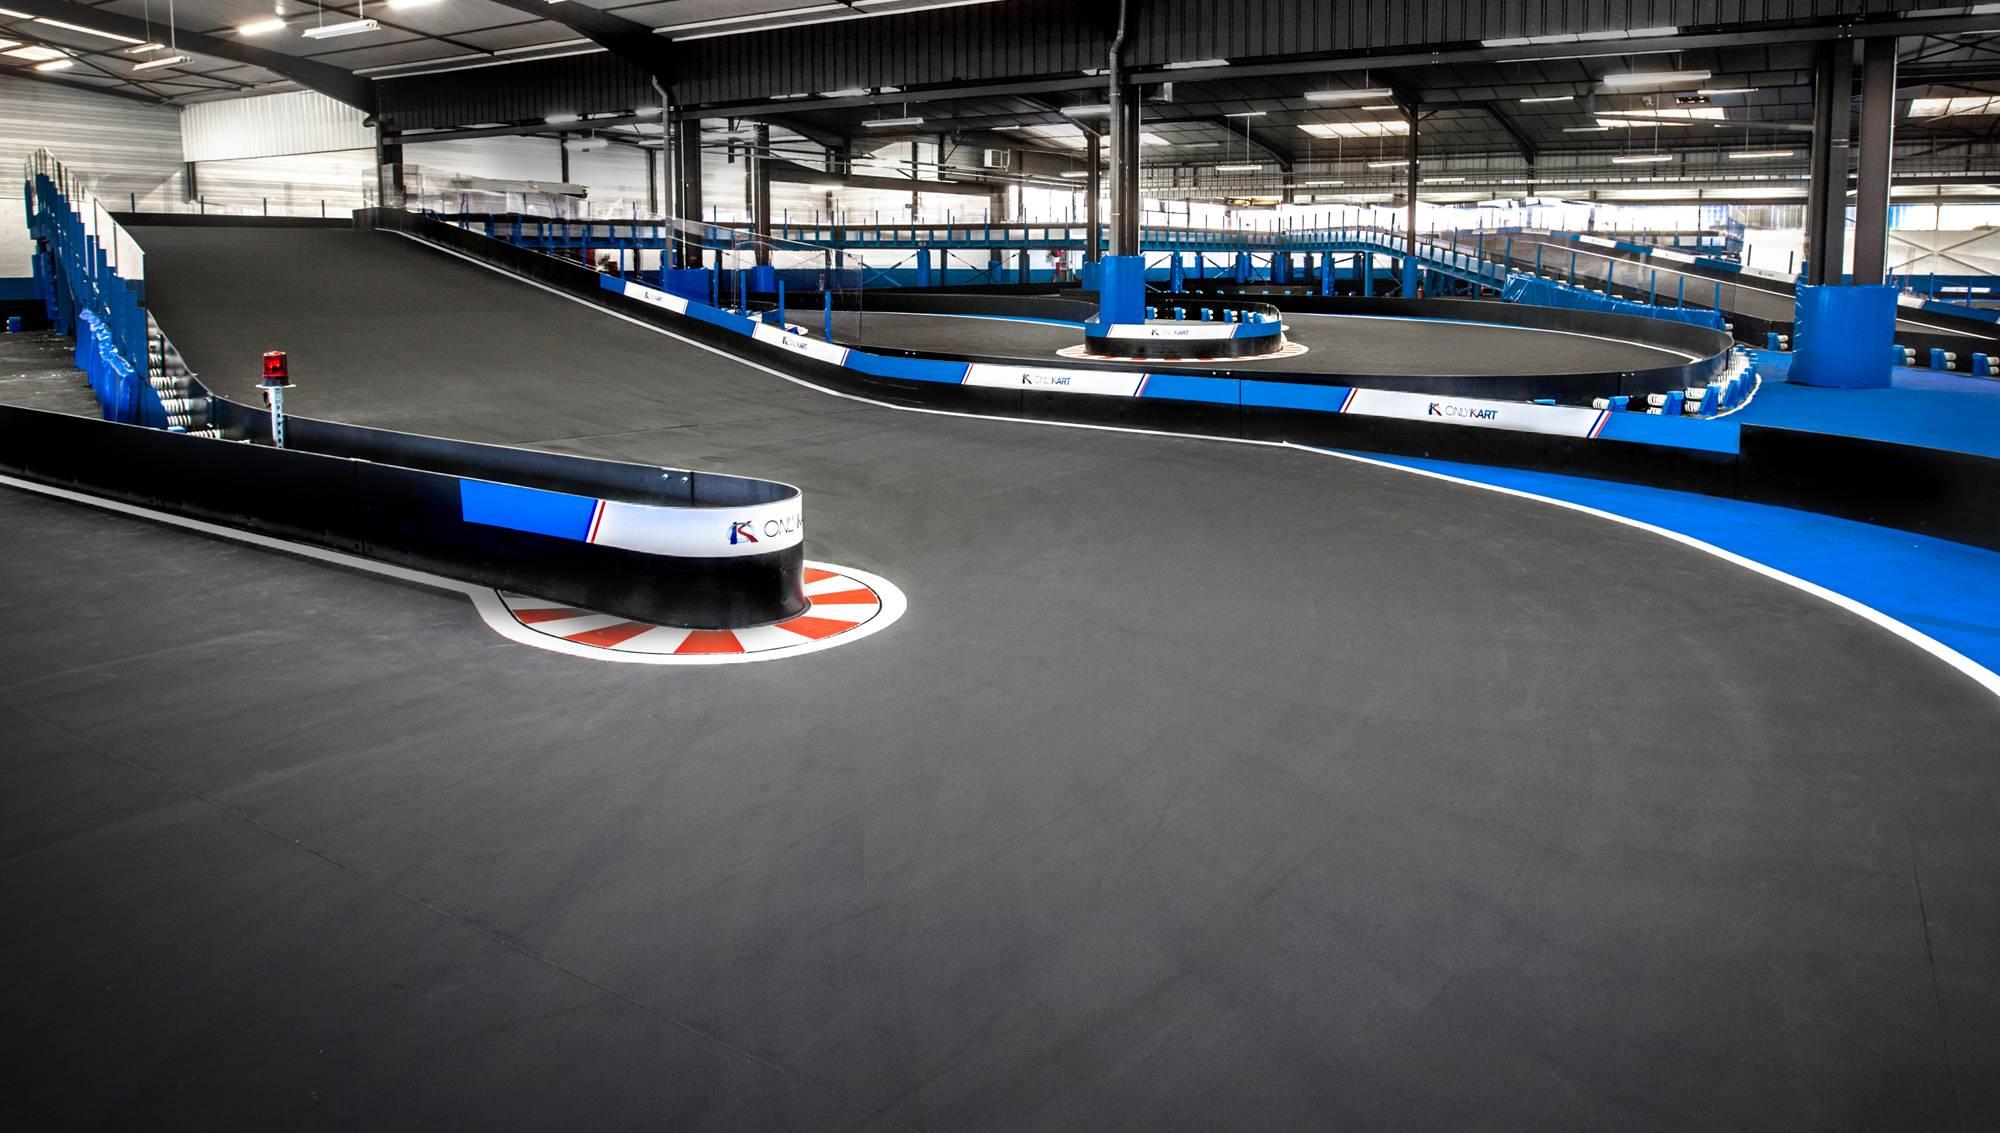 piste de karting à lyon